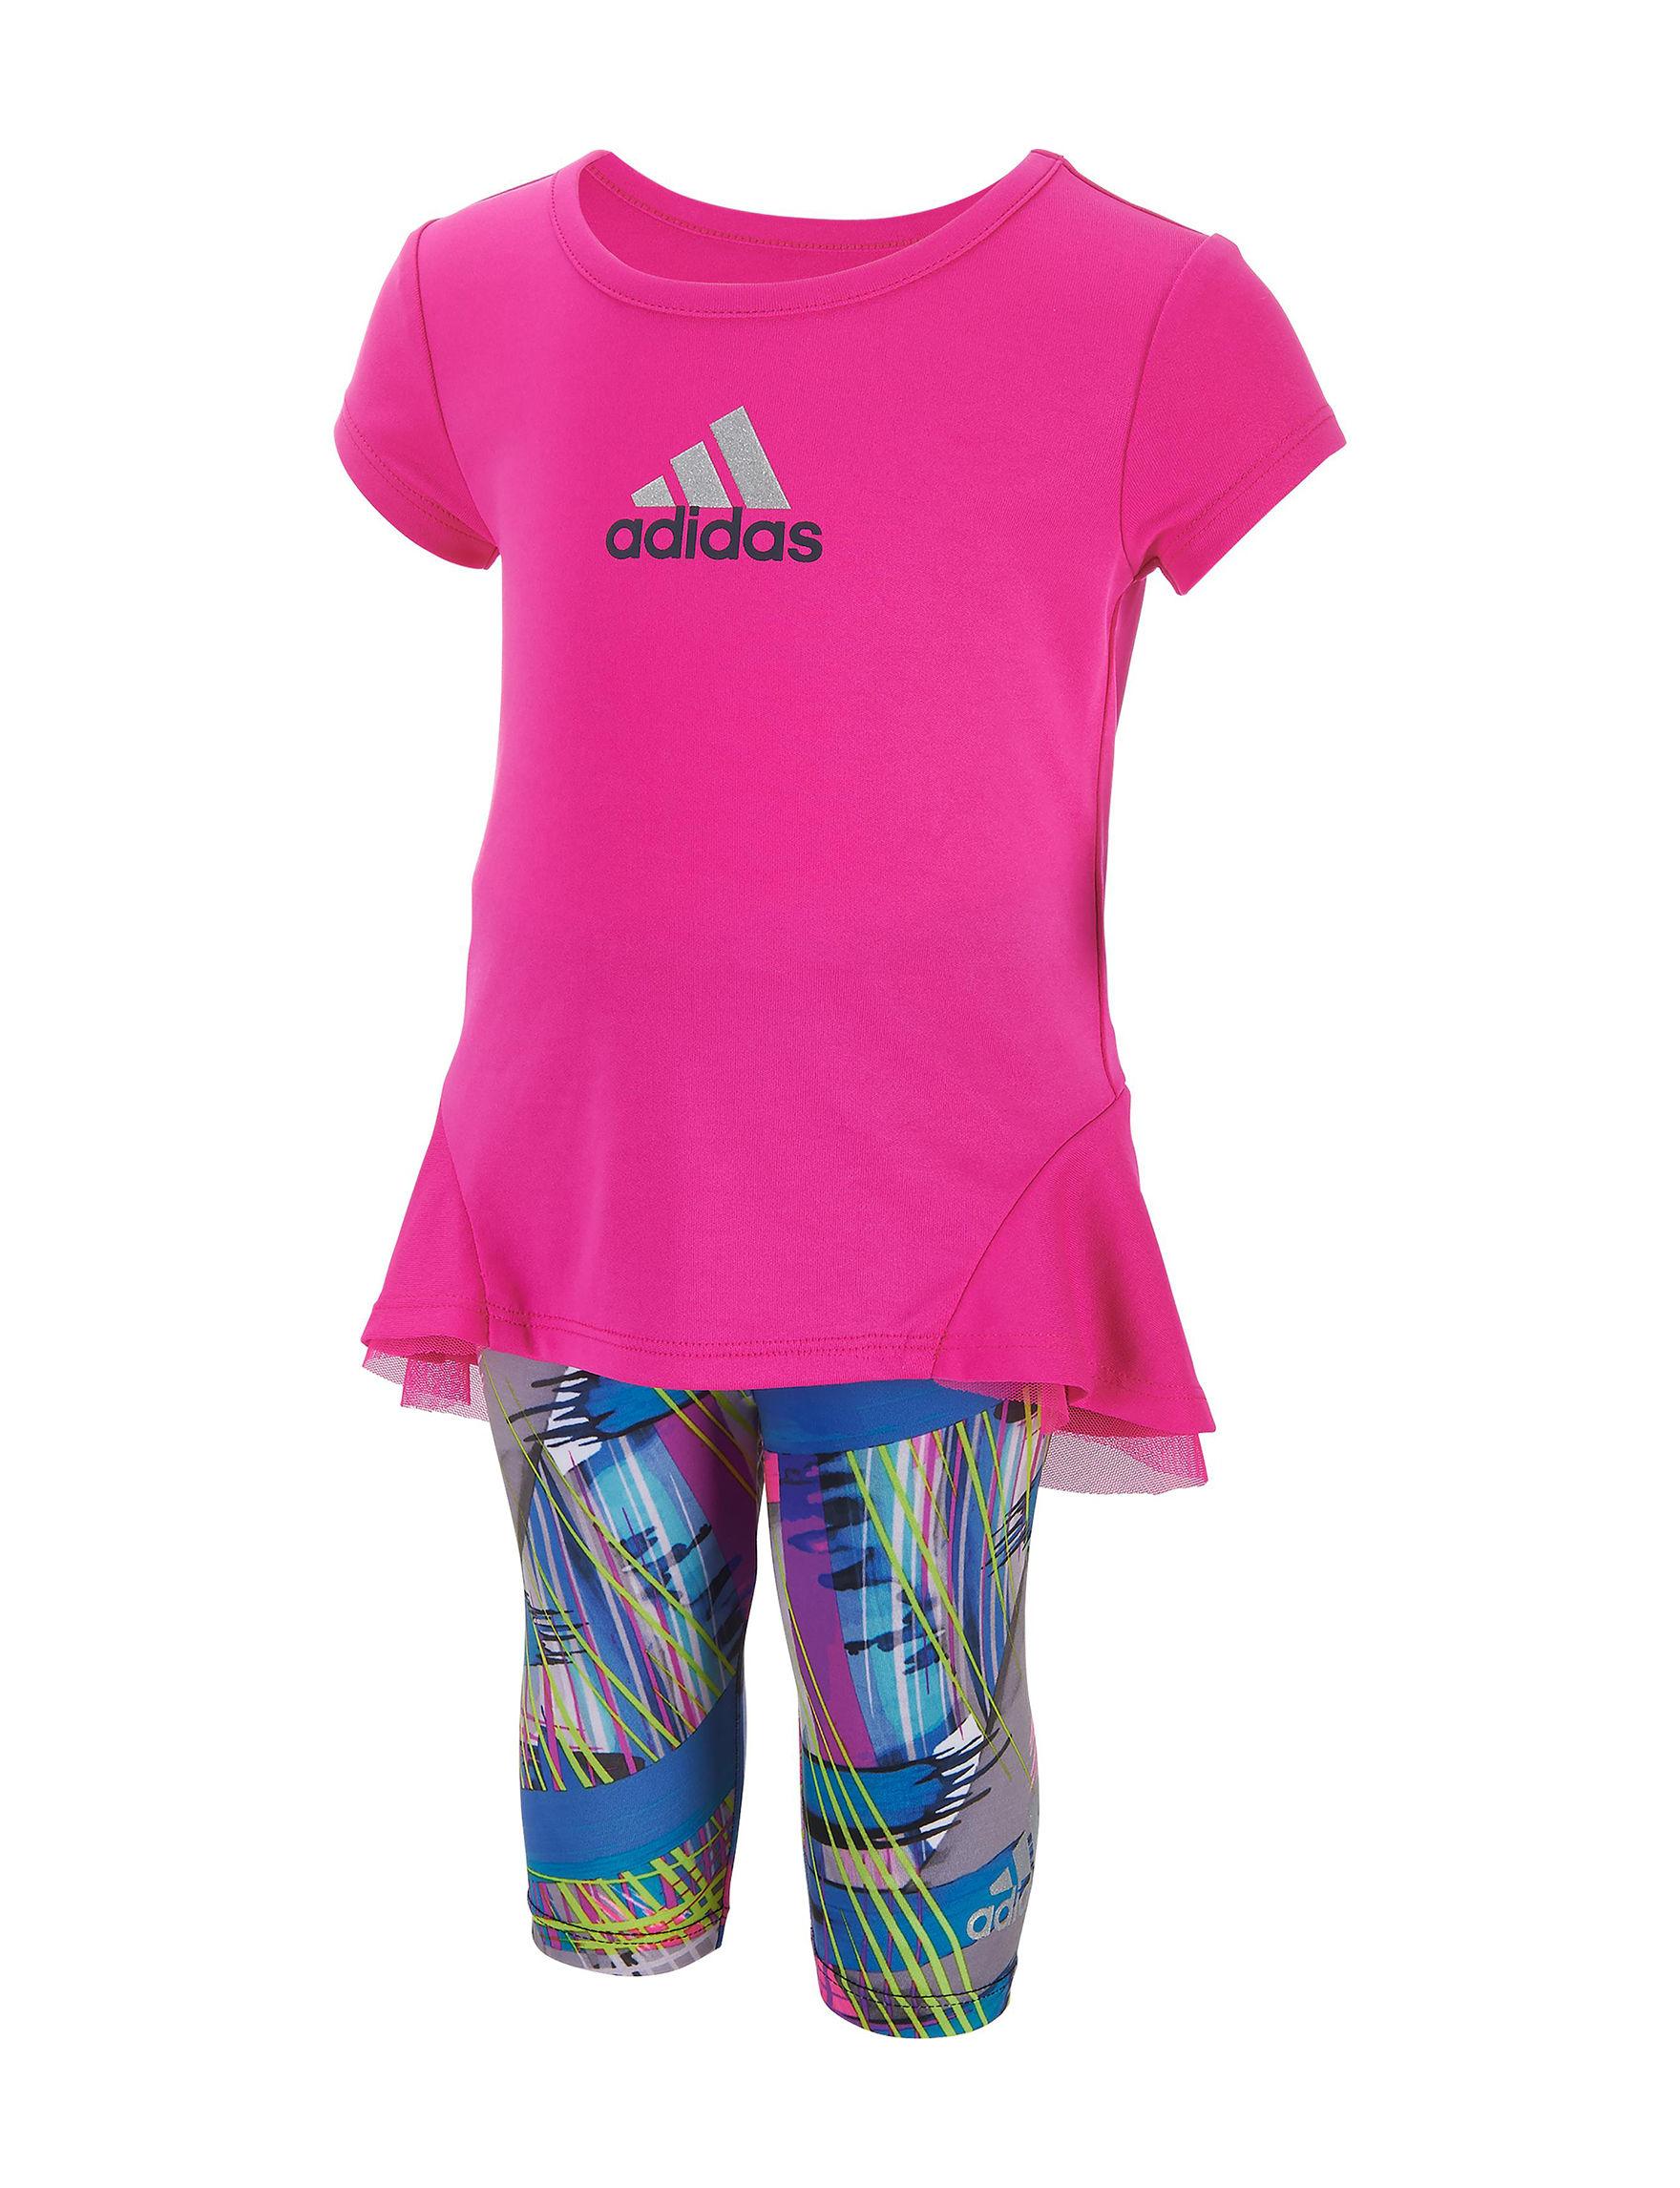 Adidas Neon Pink